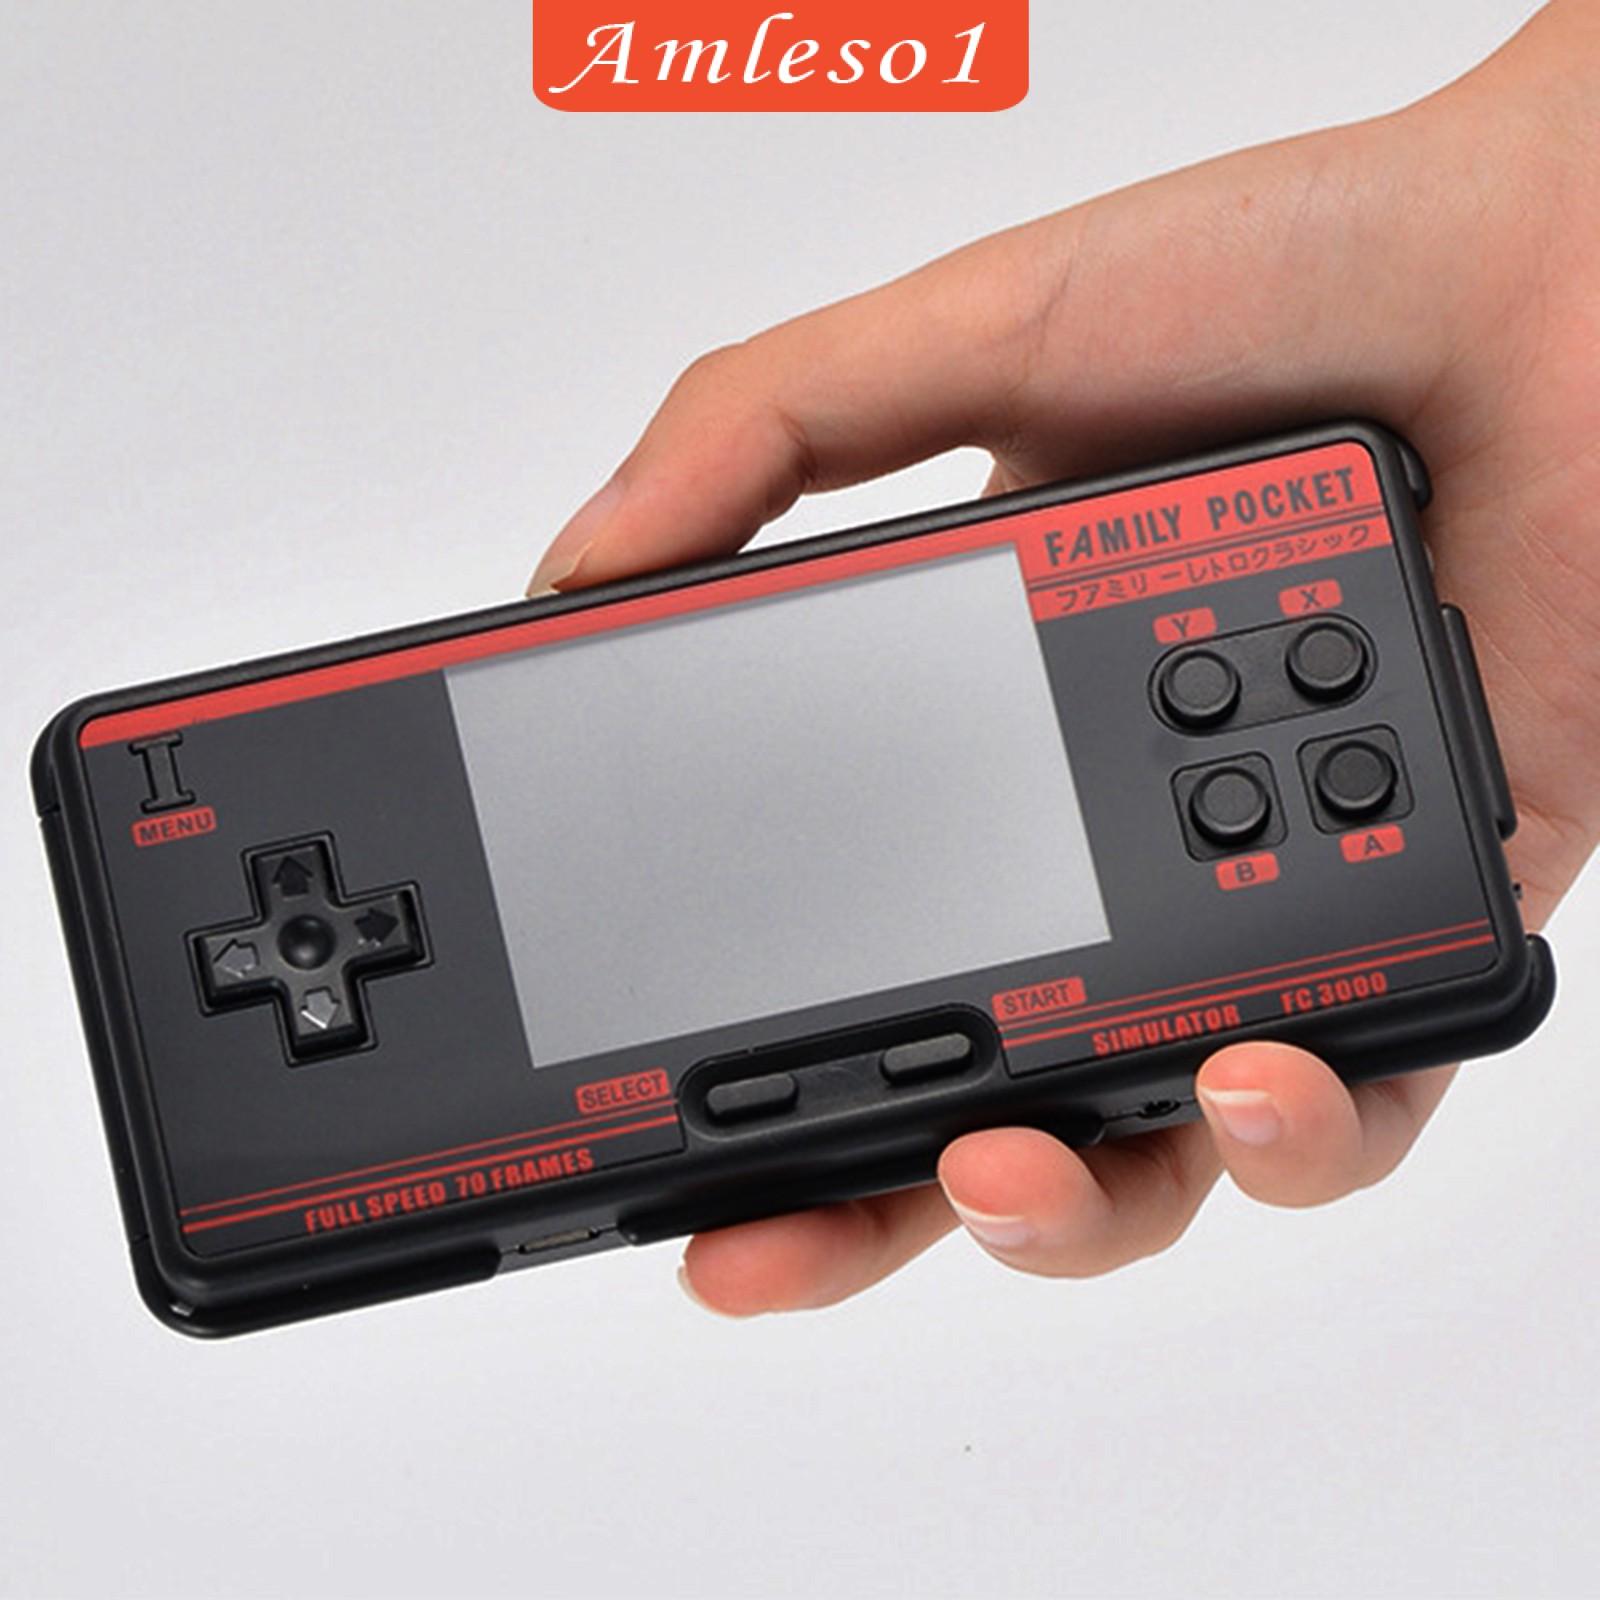 "[Amleso1] Fc3000 掌上游戲機 3\ ""高清屏幕視頻經典遊戲機"